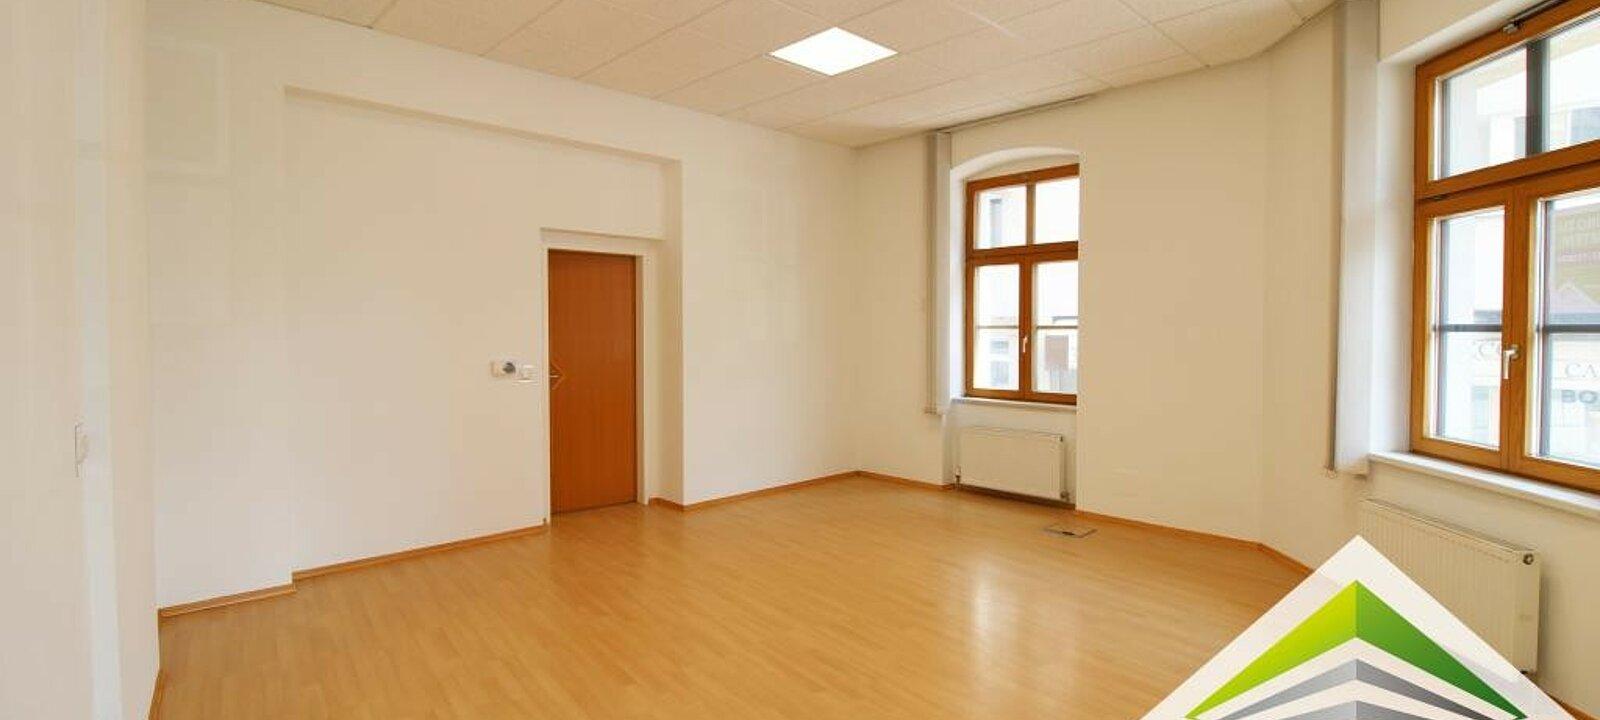 Büroraum groß 2